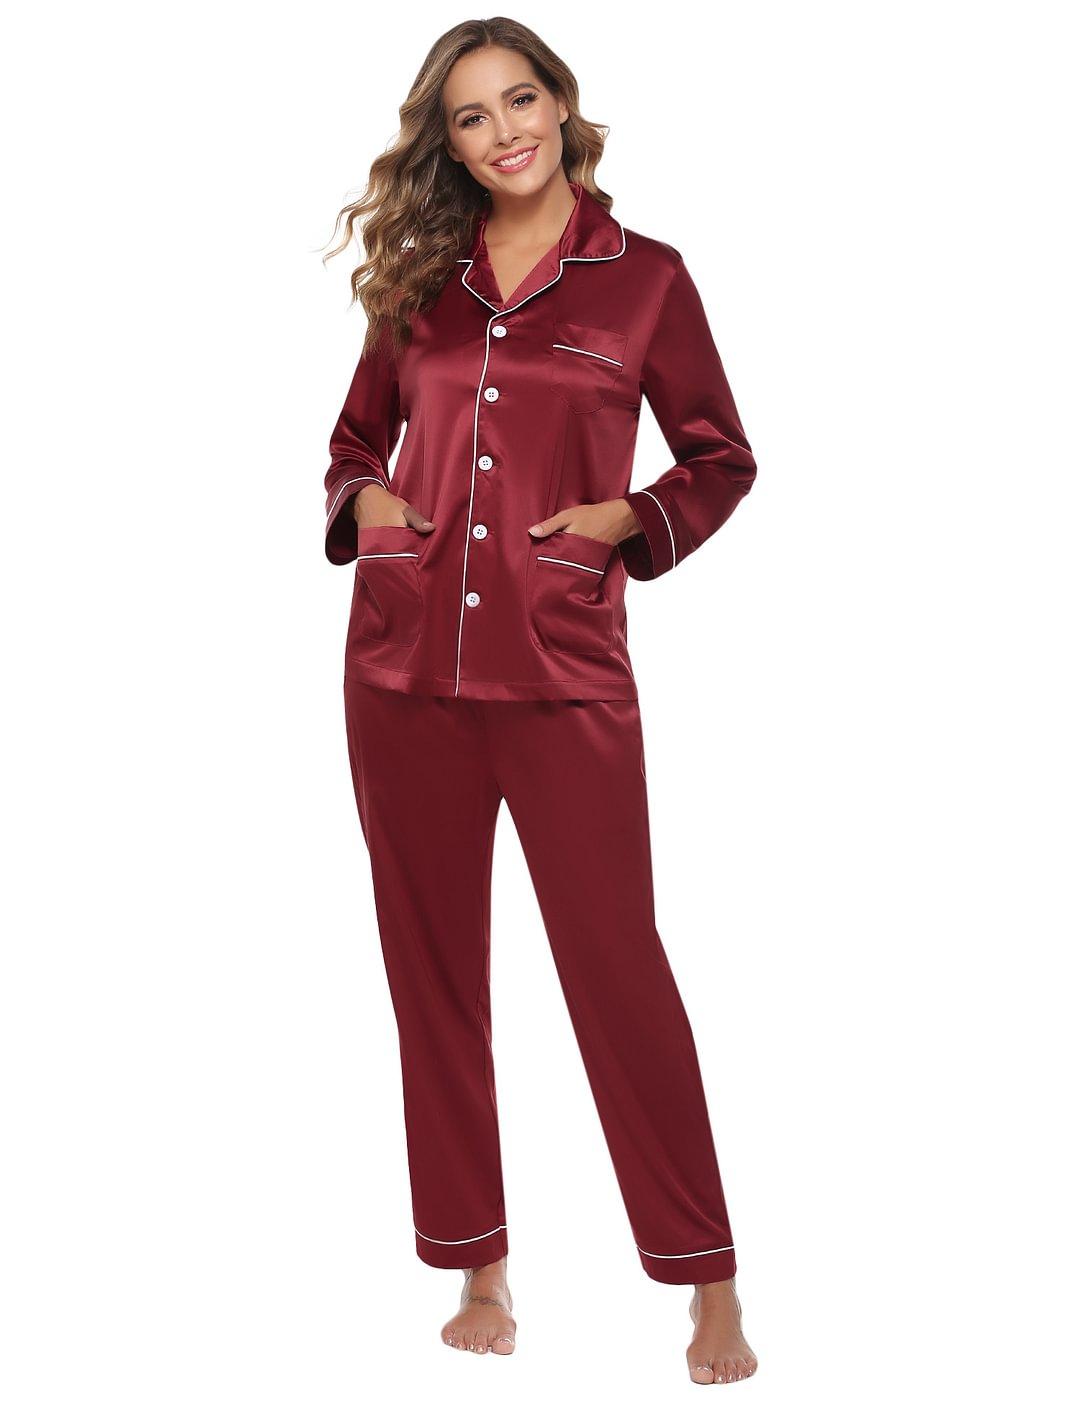 Abollria Women Cotton Pajama Set Long Sleeve Tops and Pajama Bottoms with Pockets Loungewear Set Sleepwear